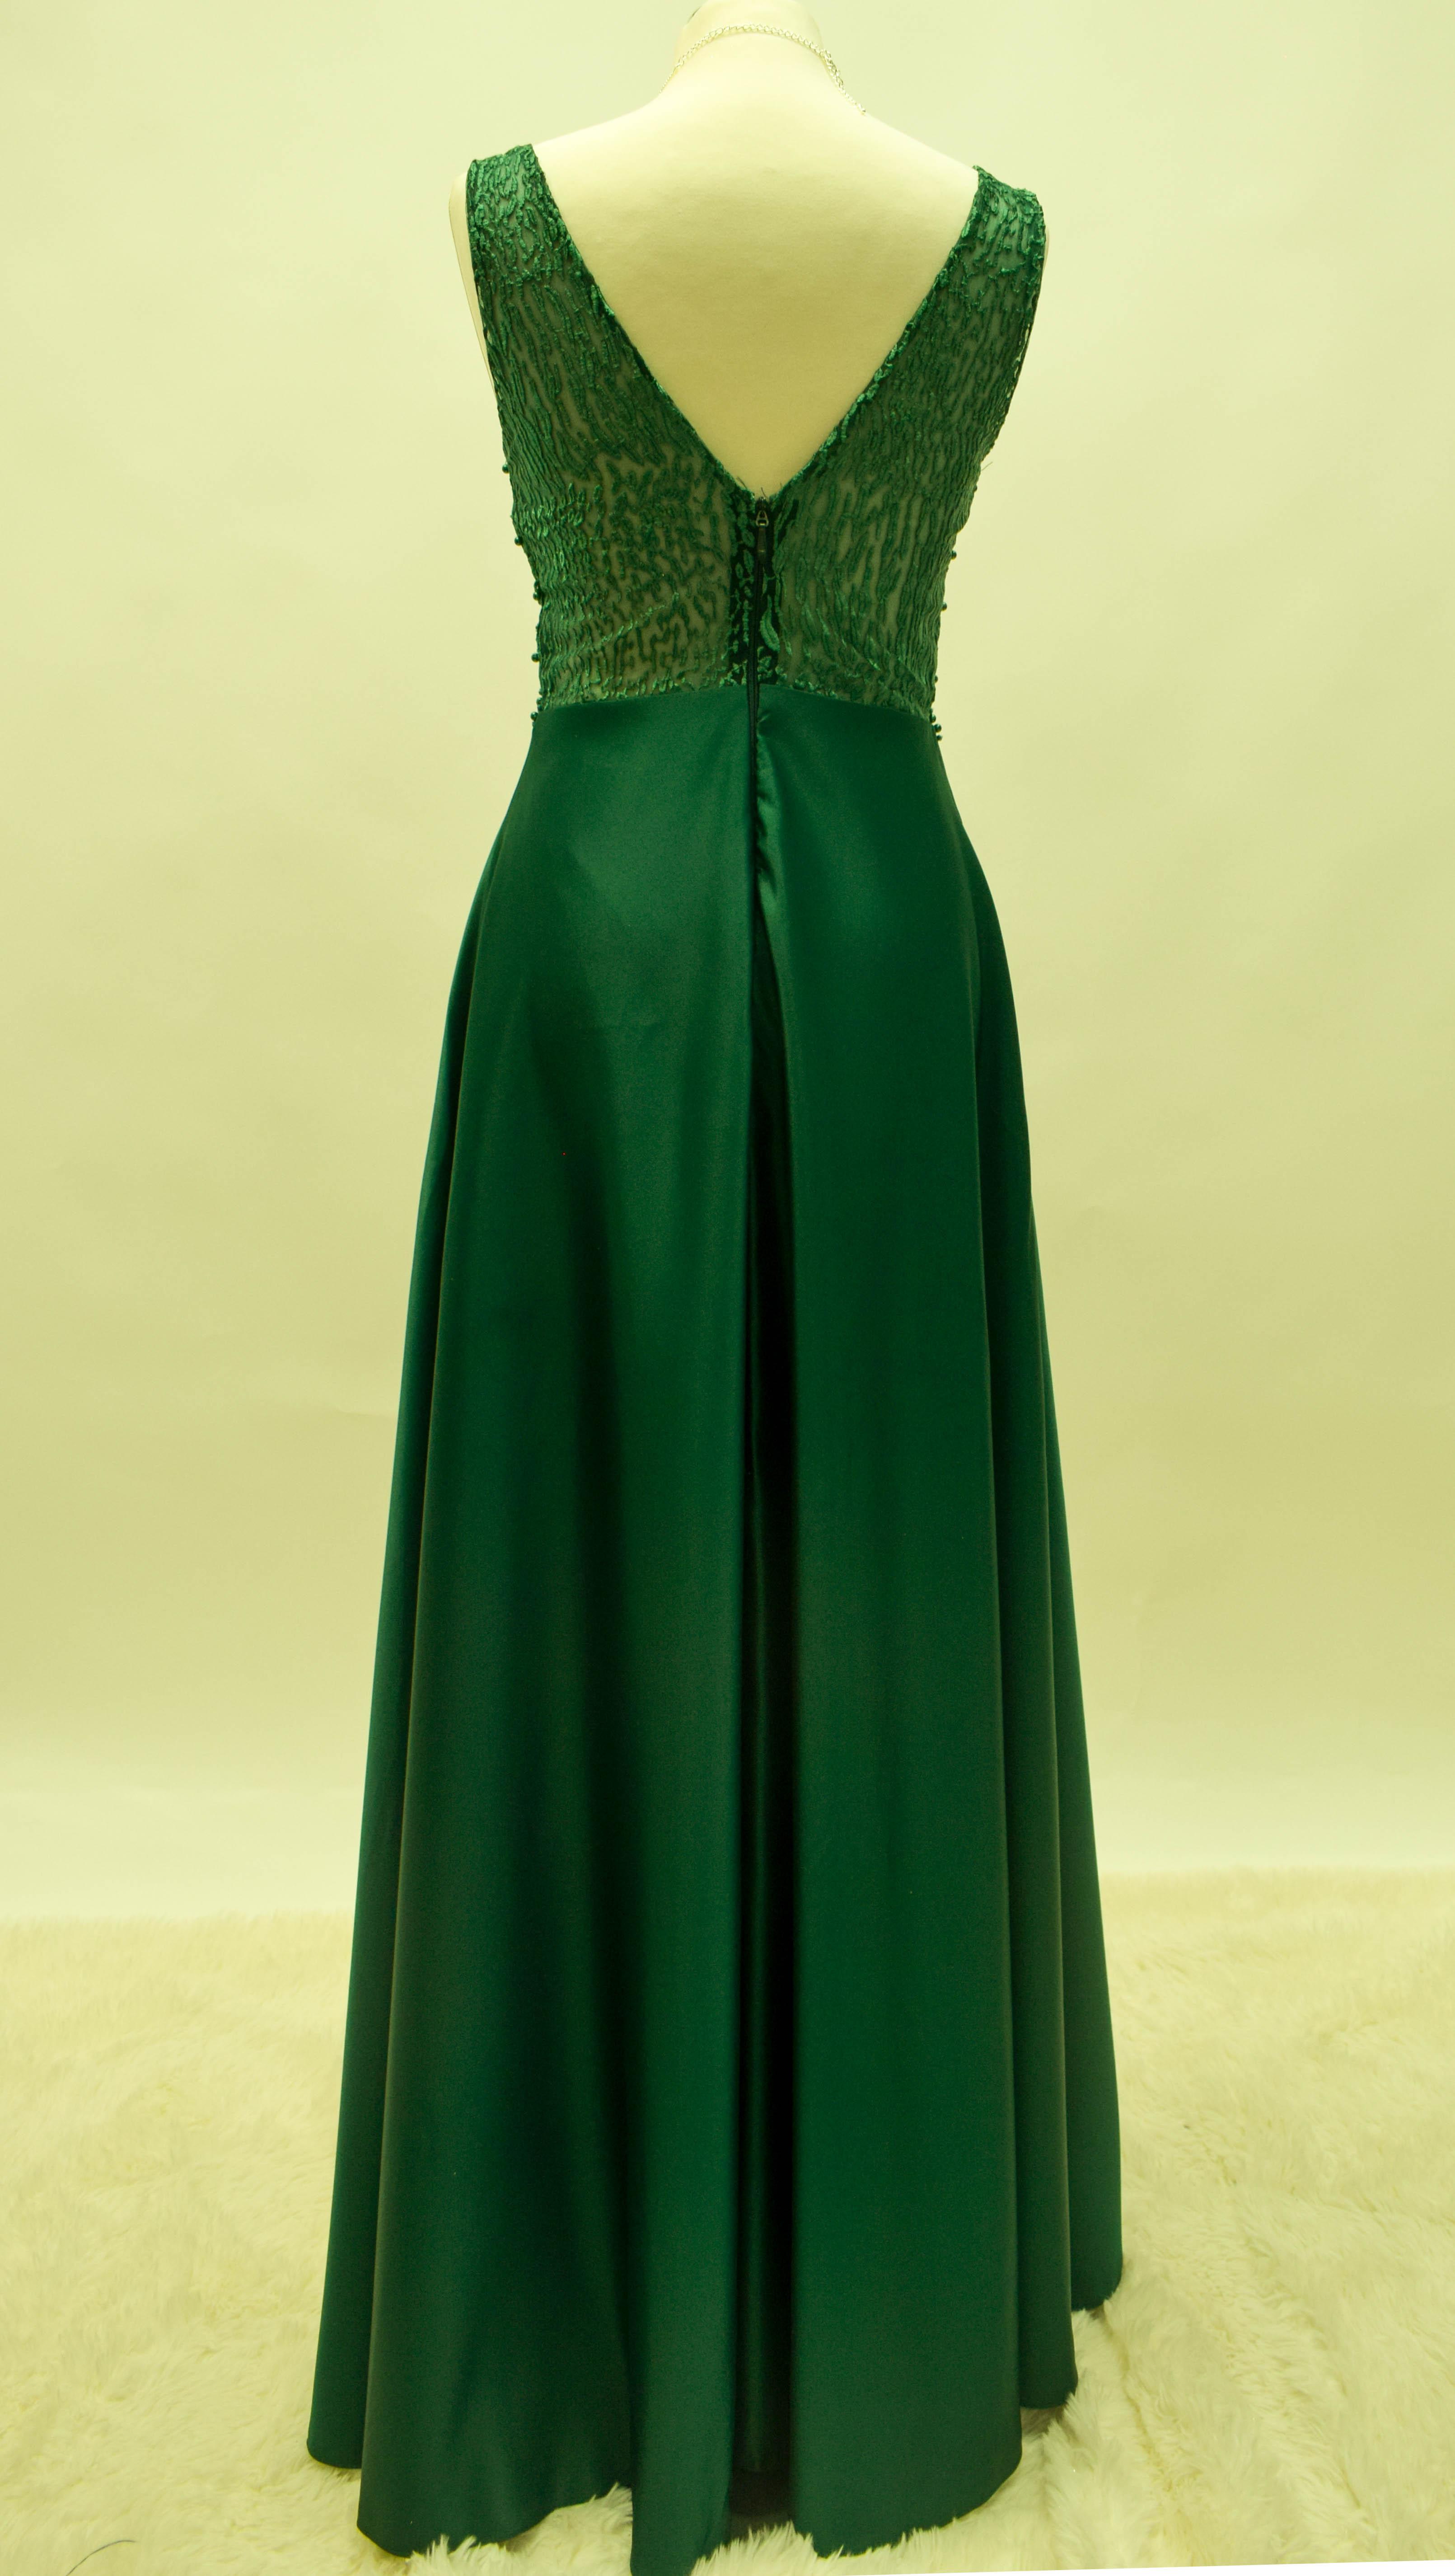 Abendkleid in Bordeux, Marineblau, Tannengrün